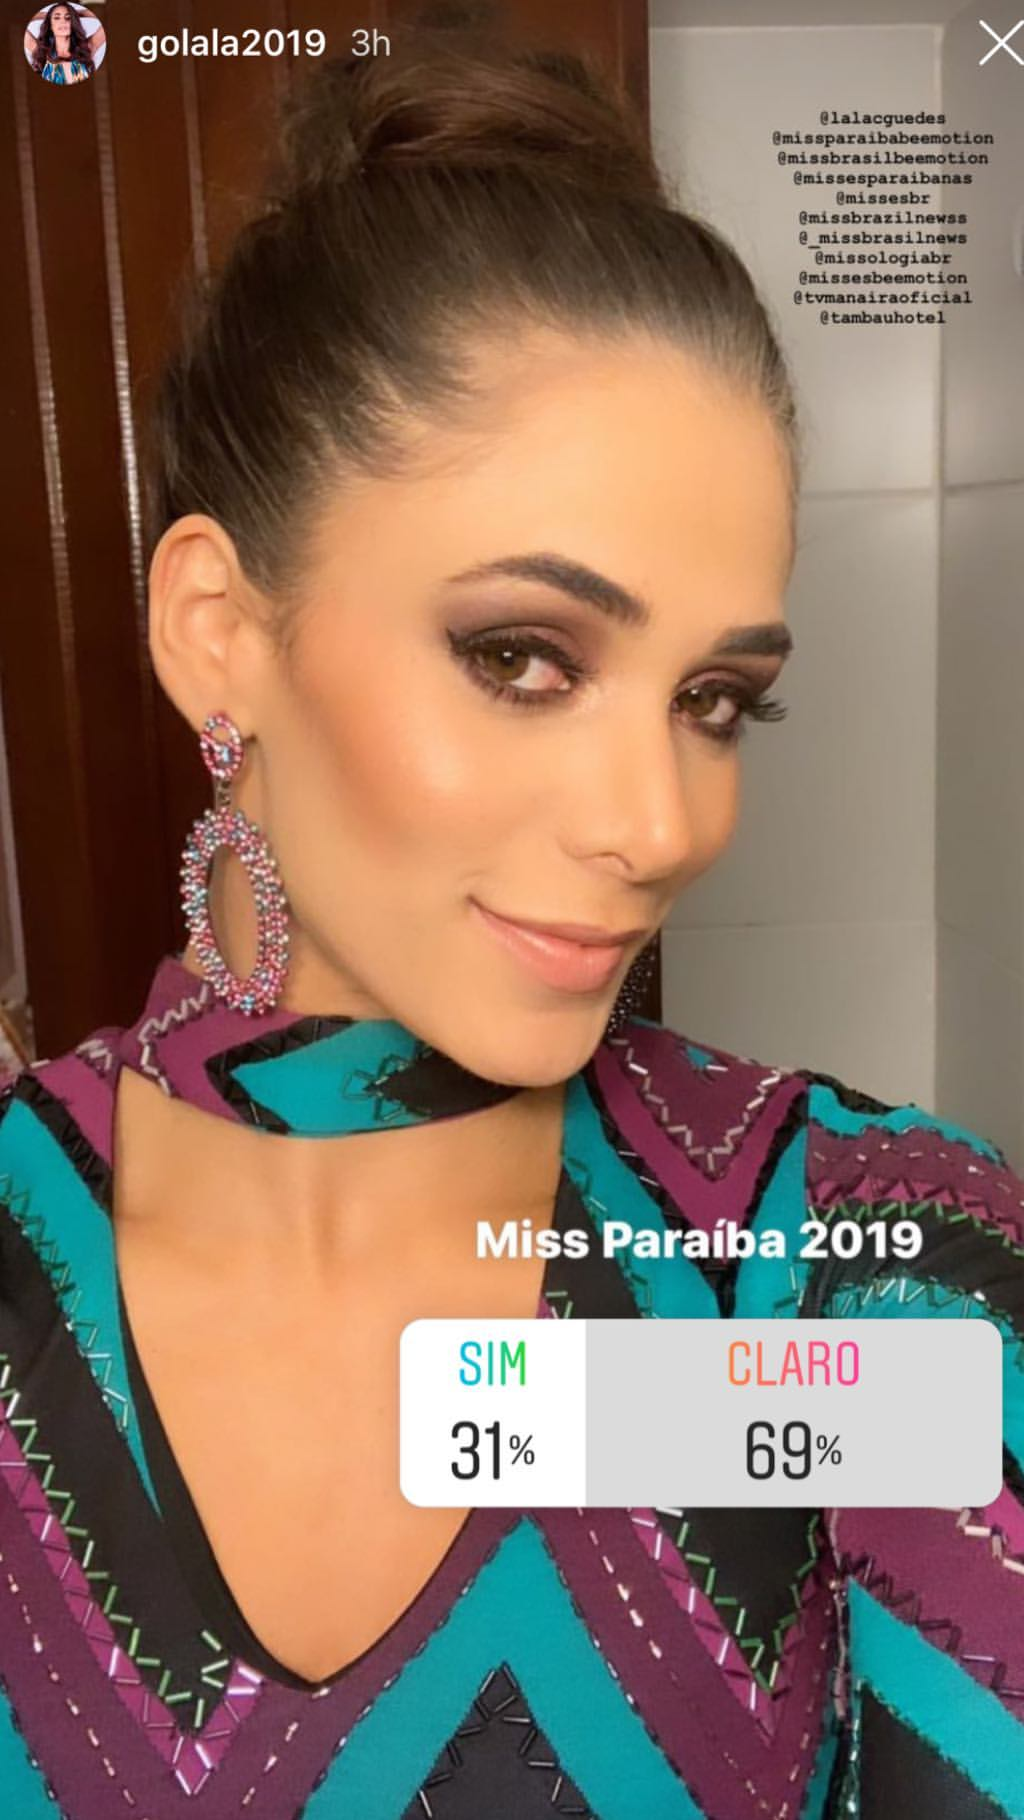 lala guedes, miss grand brasil 2020. - Página 5 51383610